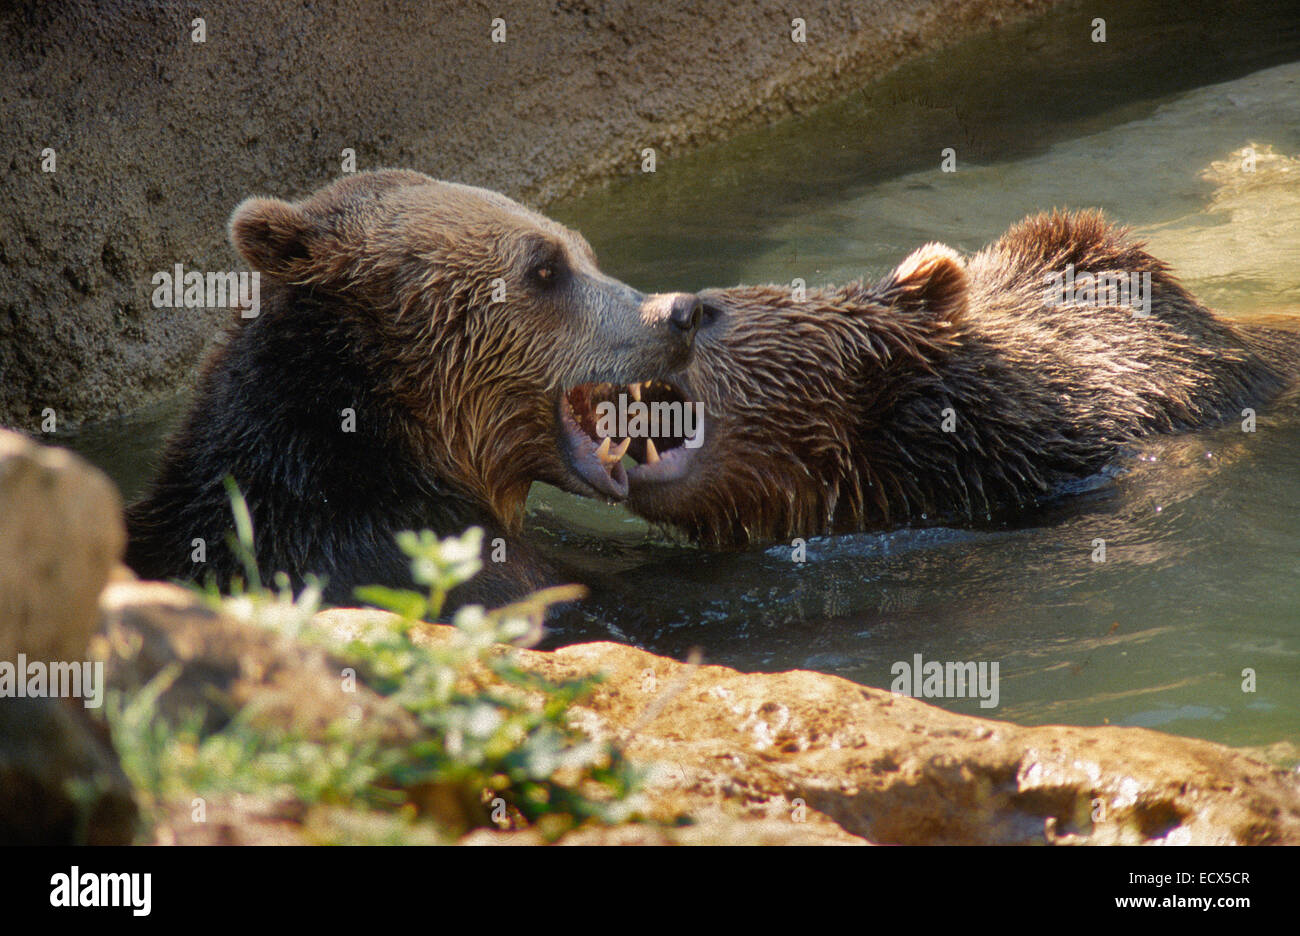 Oso Pardo, Ursus arctos, Ursidae, Parque Zoológico de Roma, Italia Imagen De Stock